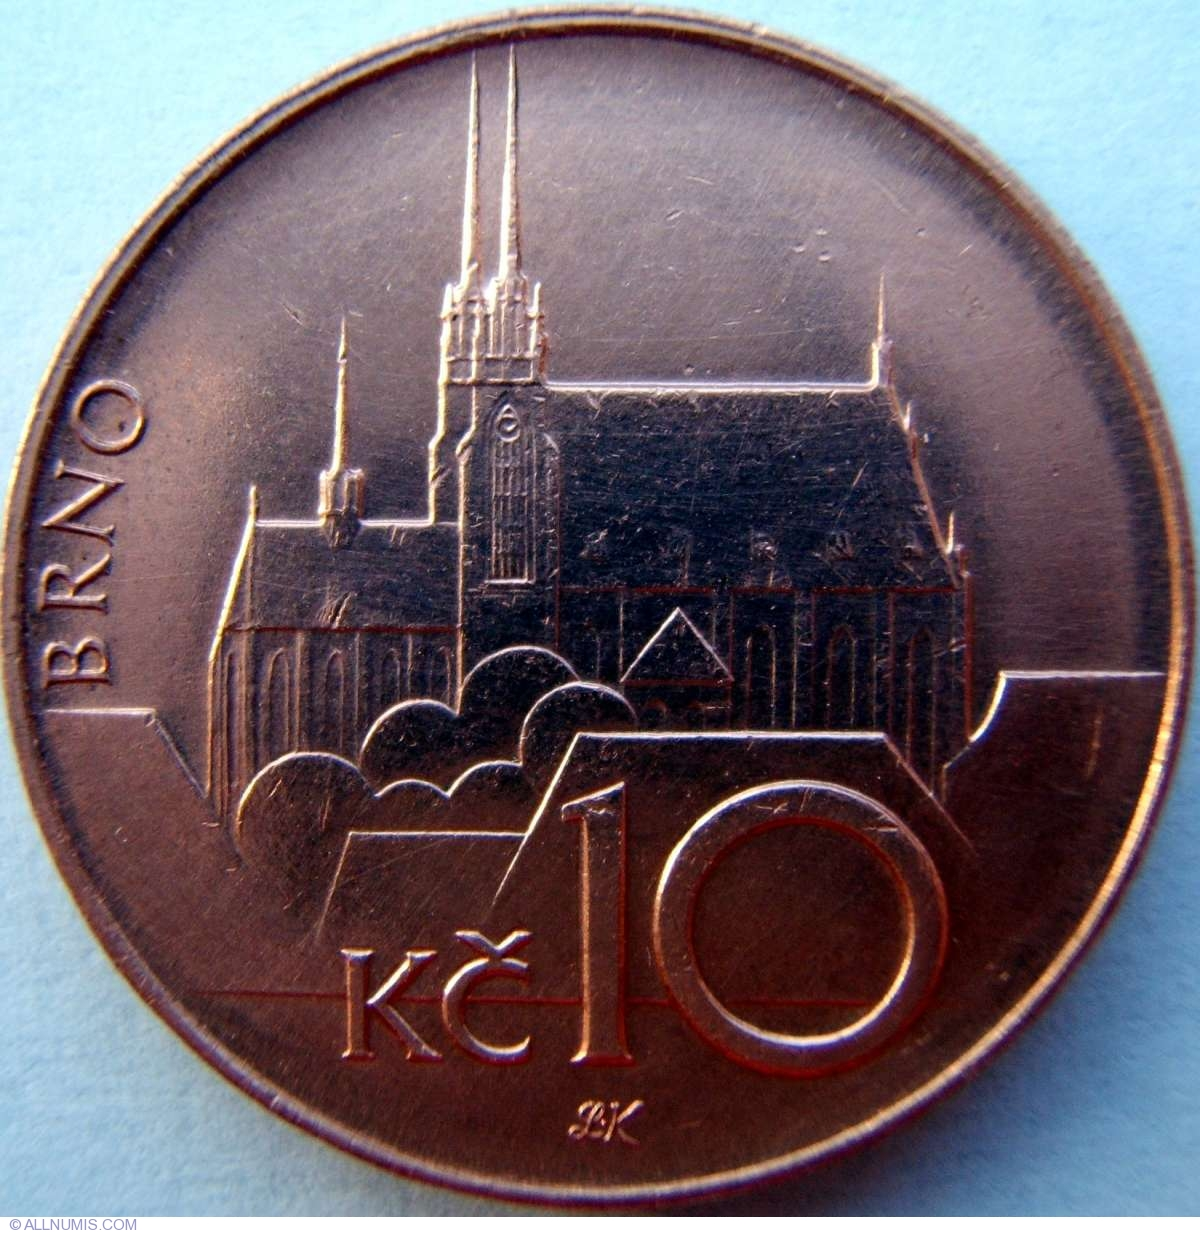 10 Korun 1995, Republic (1993 - 2010) - Czech Republic